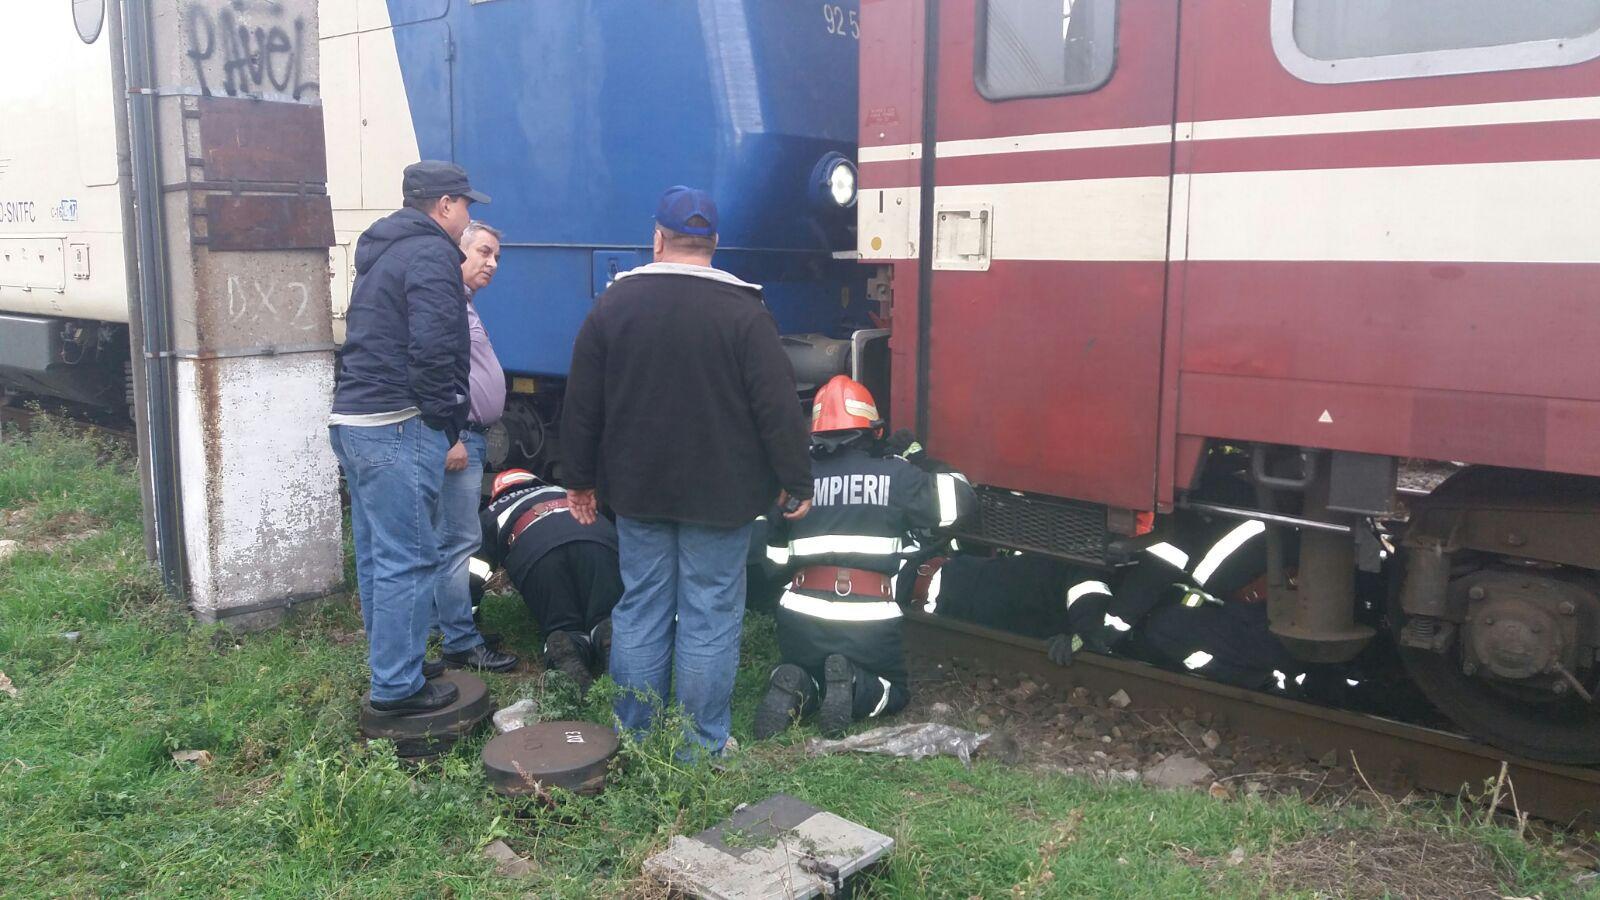 Un bărbat a fost lovit de tren în Gara Basarab - FOTO